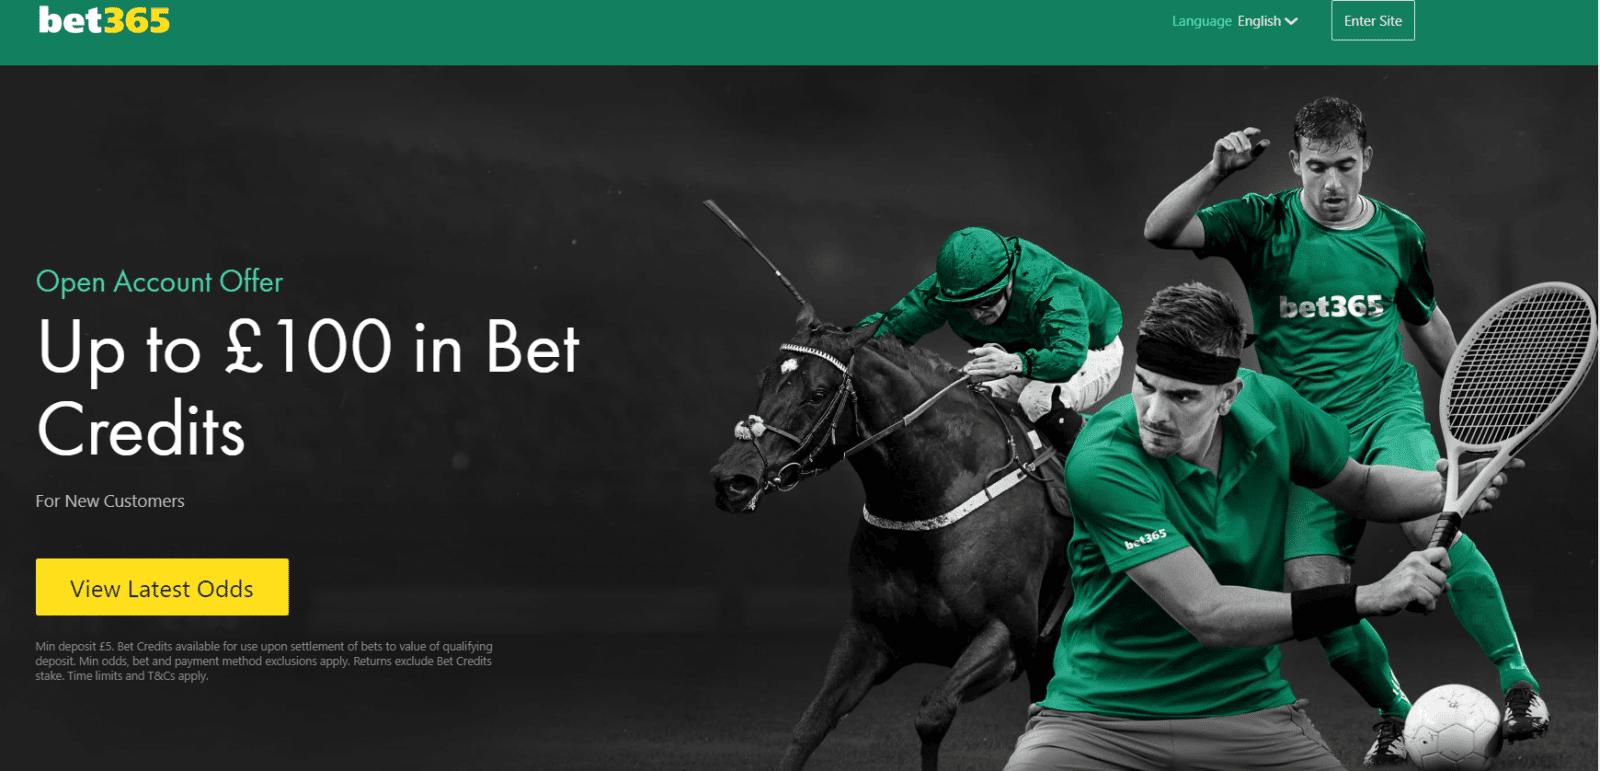 Bet365 tennis betting